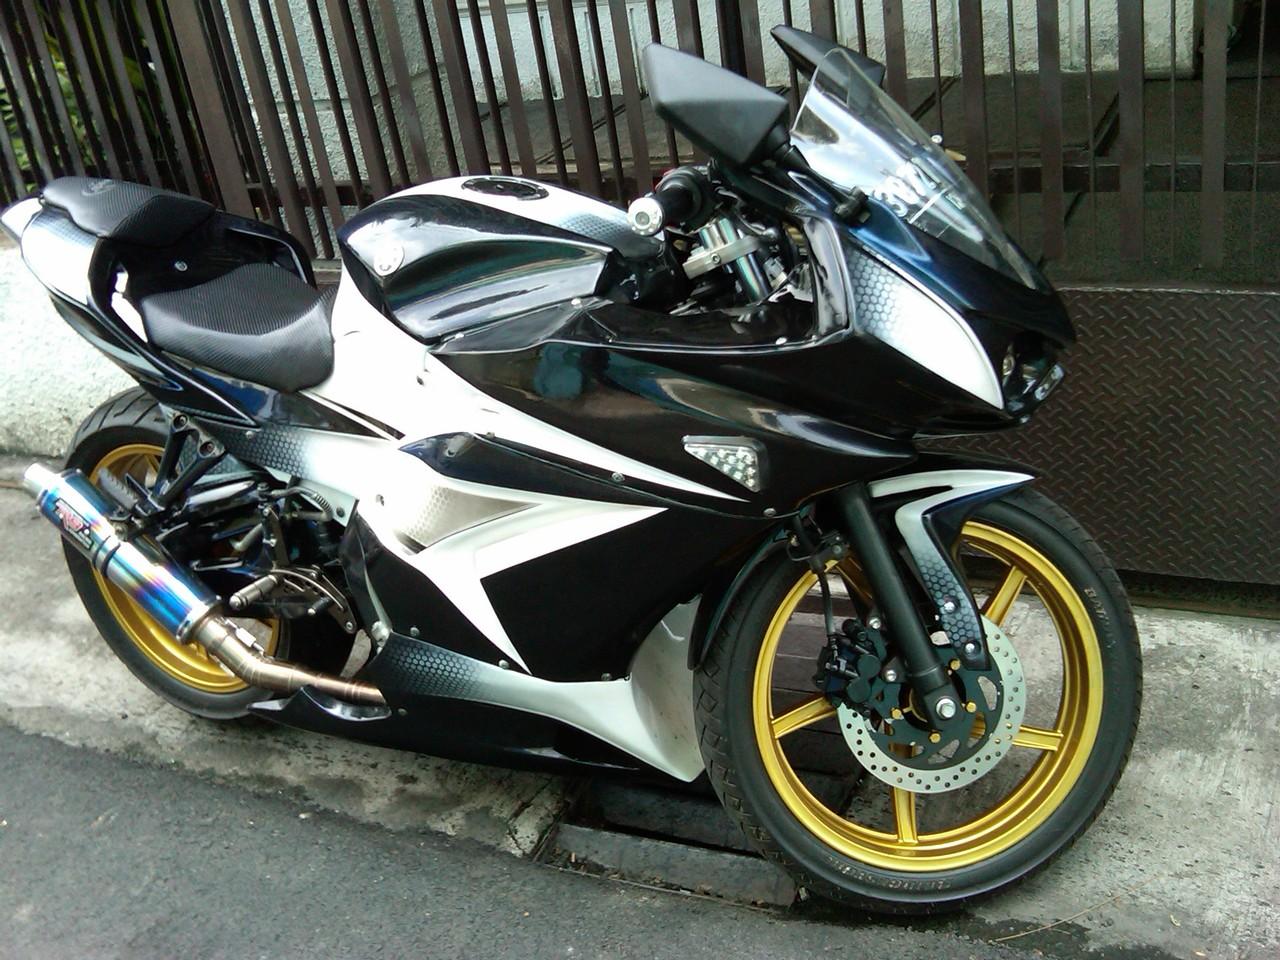 Bengkel Modifikasi Motor Yamaha Vixion Modifikasi Motor Yamaha